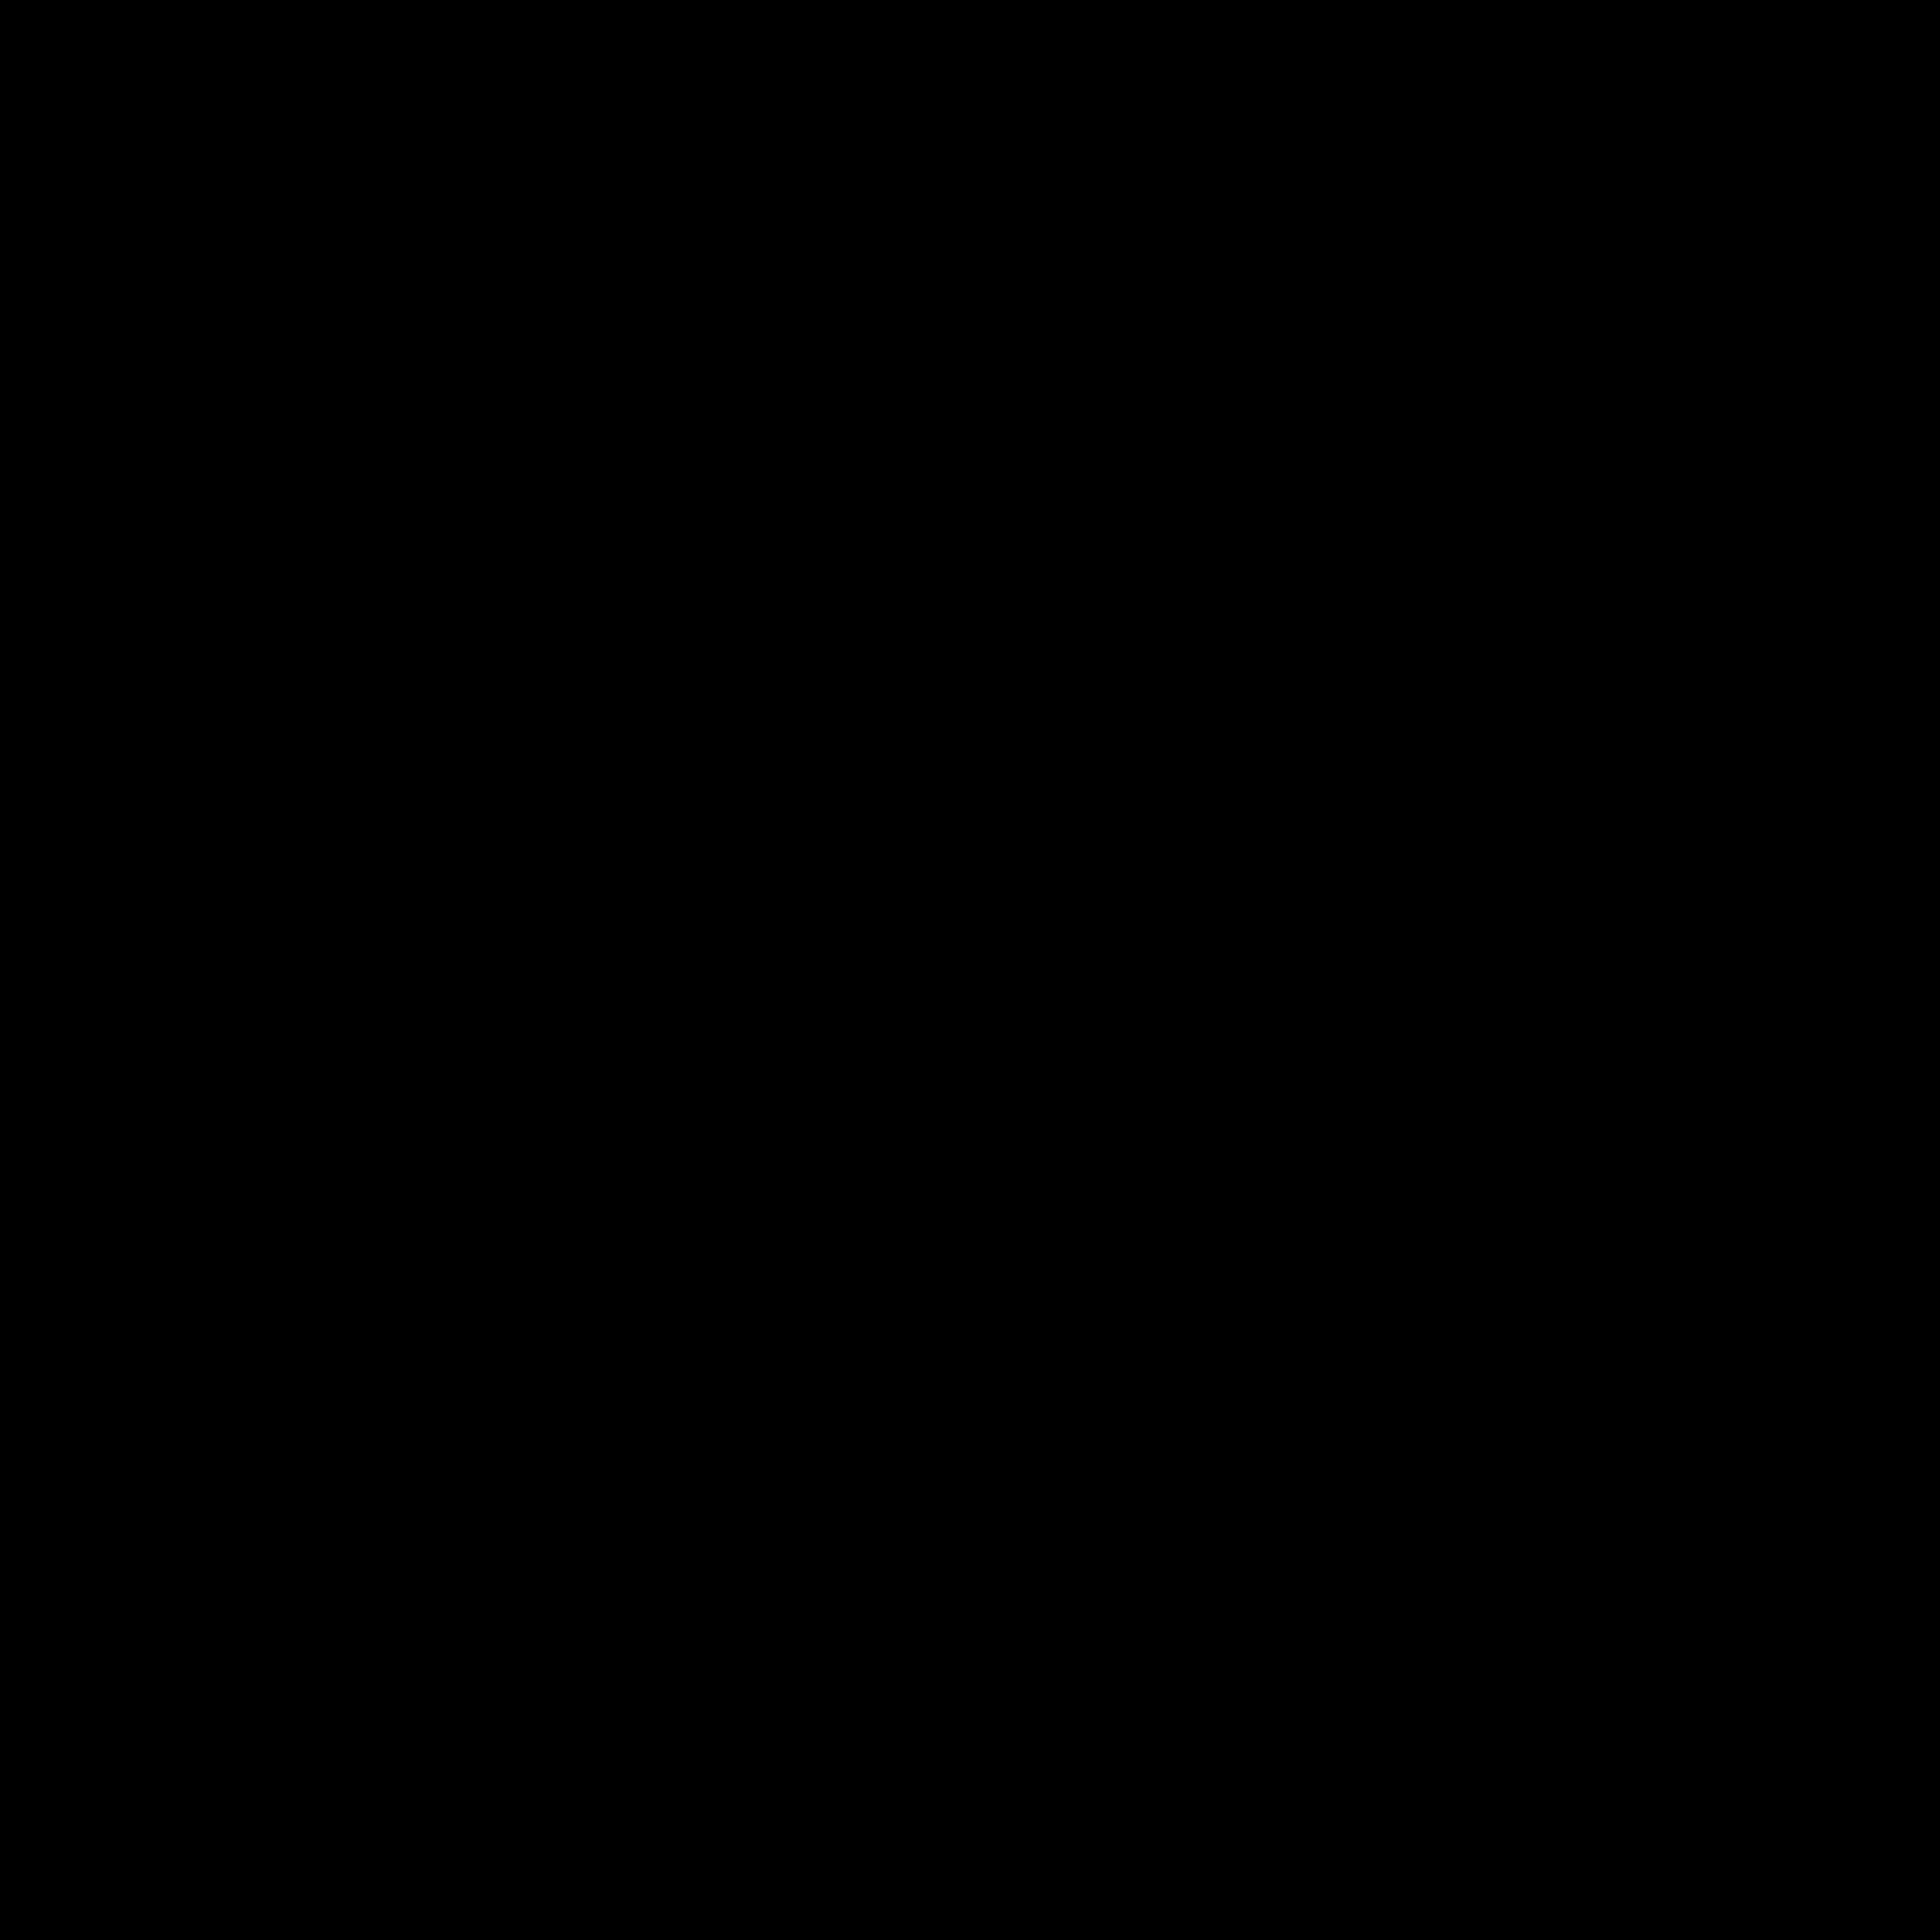 Turun Valkonauhan logo